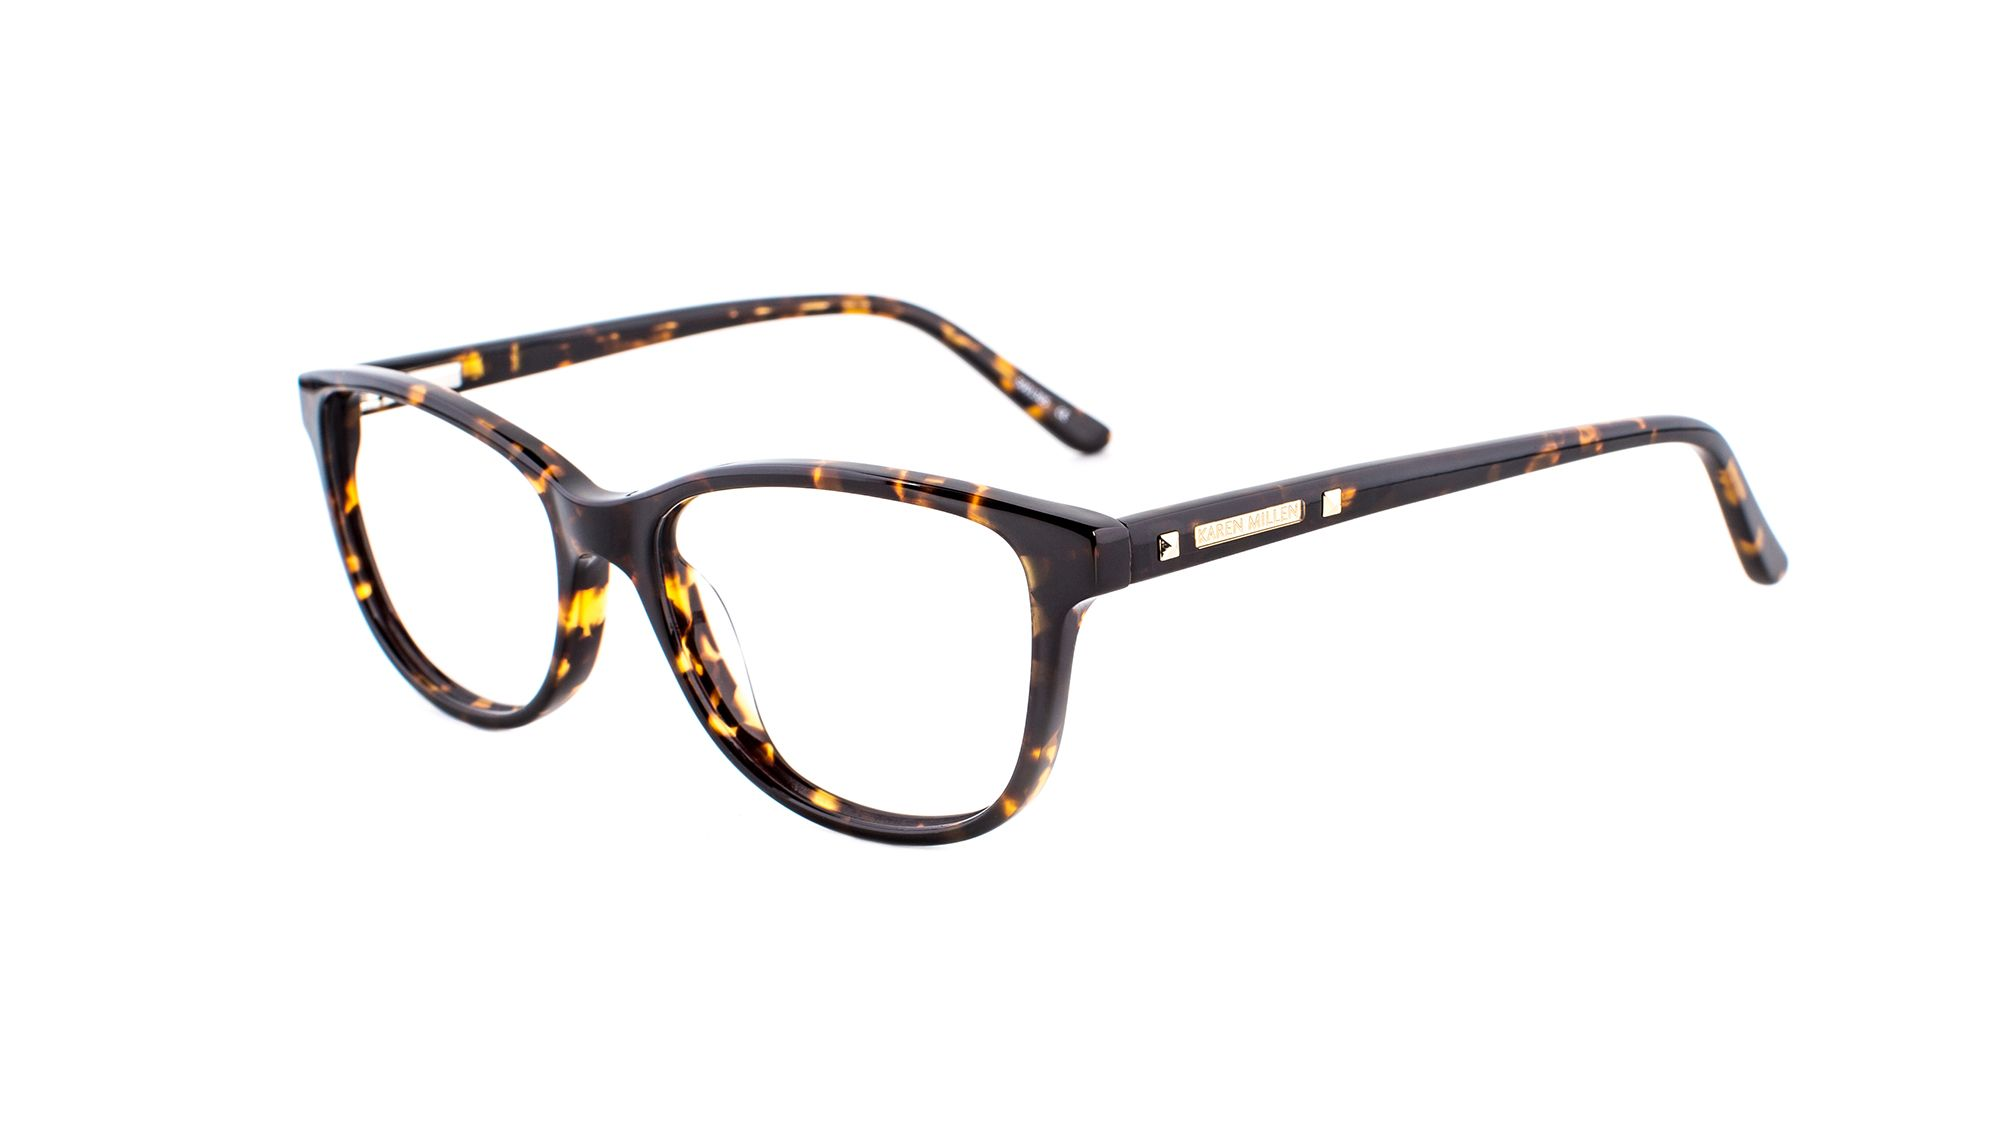 d383e9a1df Karen Millen glasses - KM 57